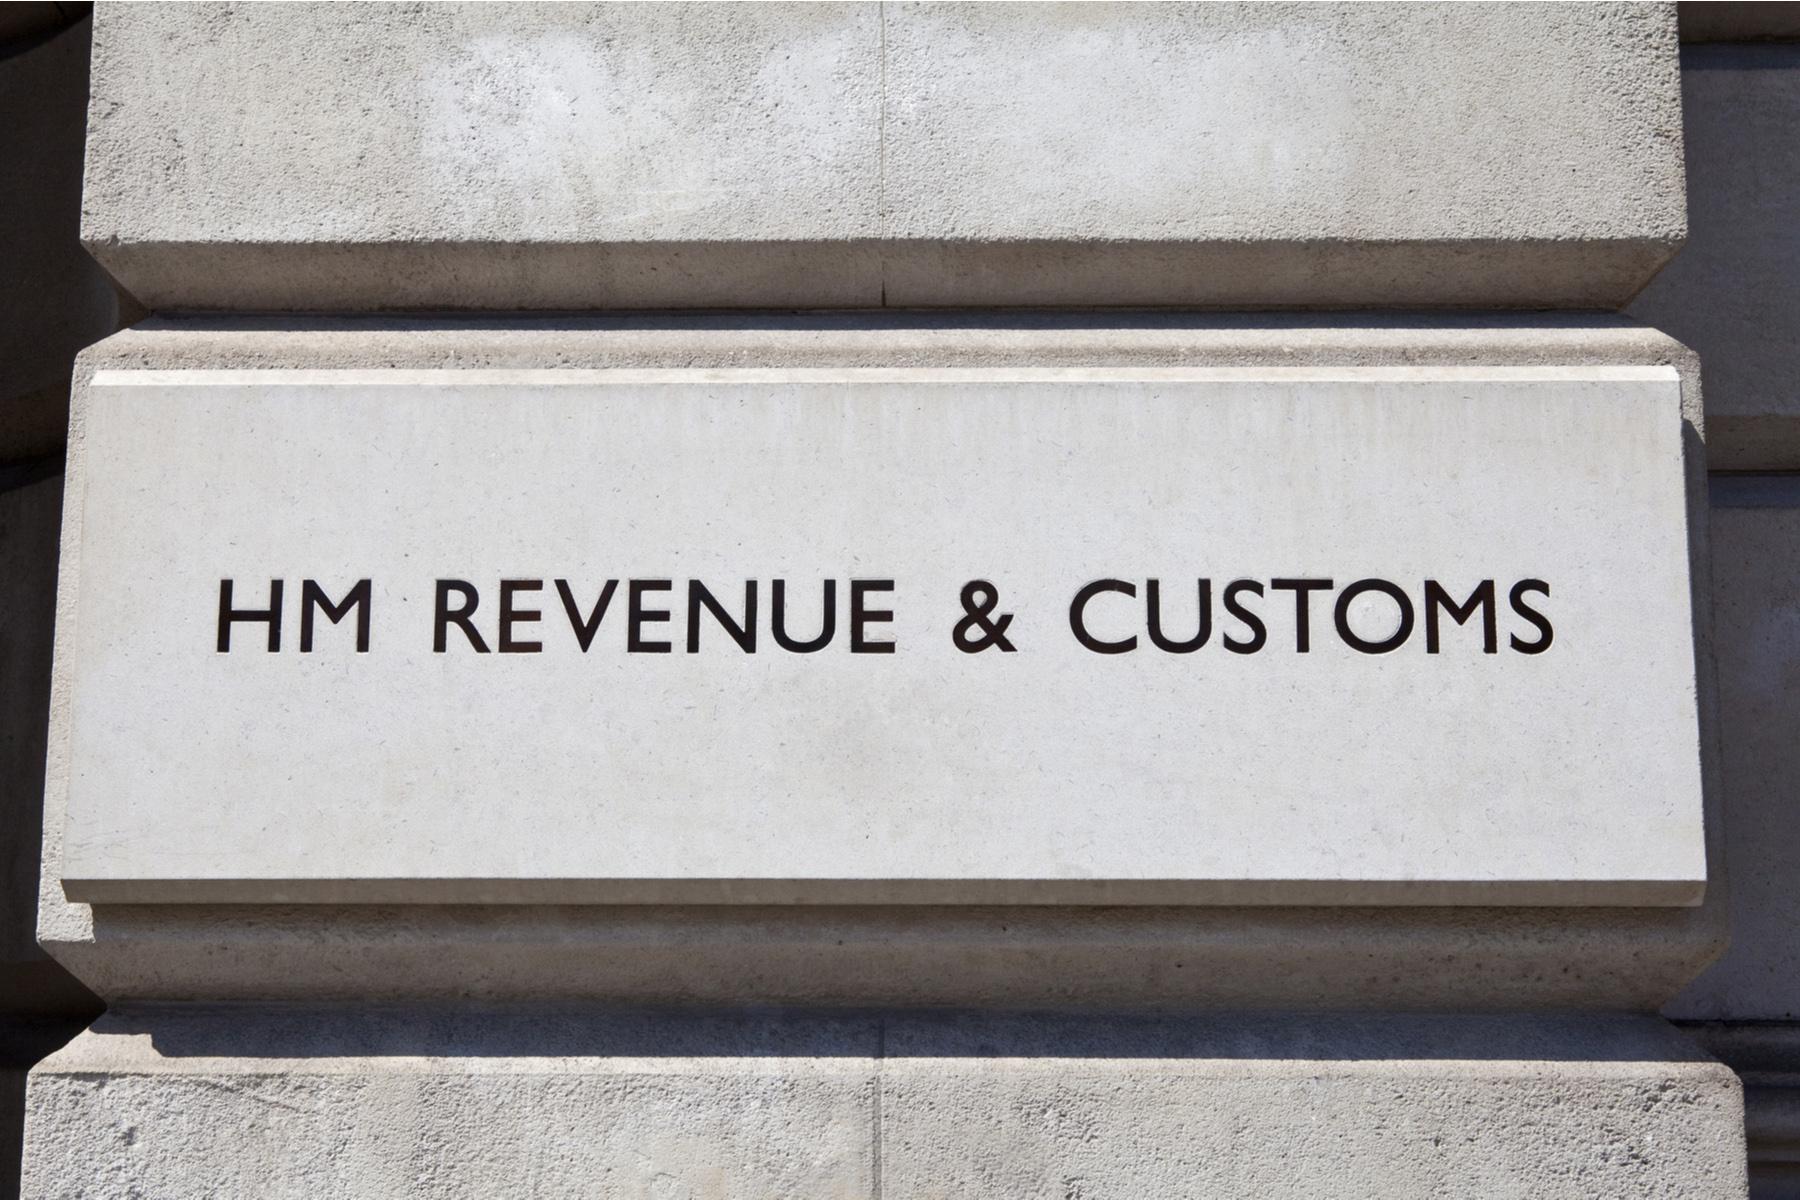 HMRC building in London